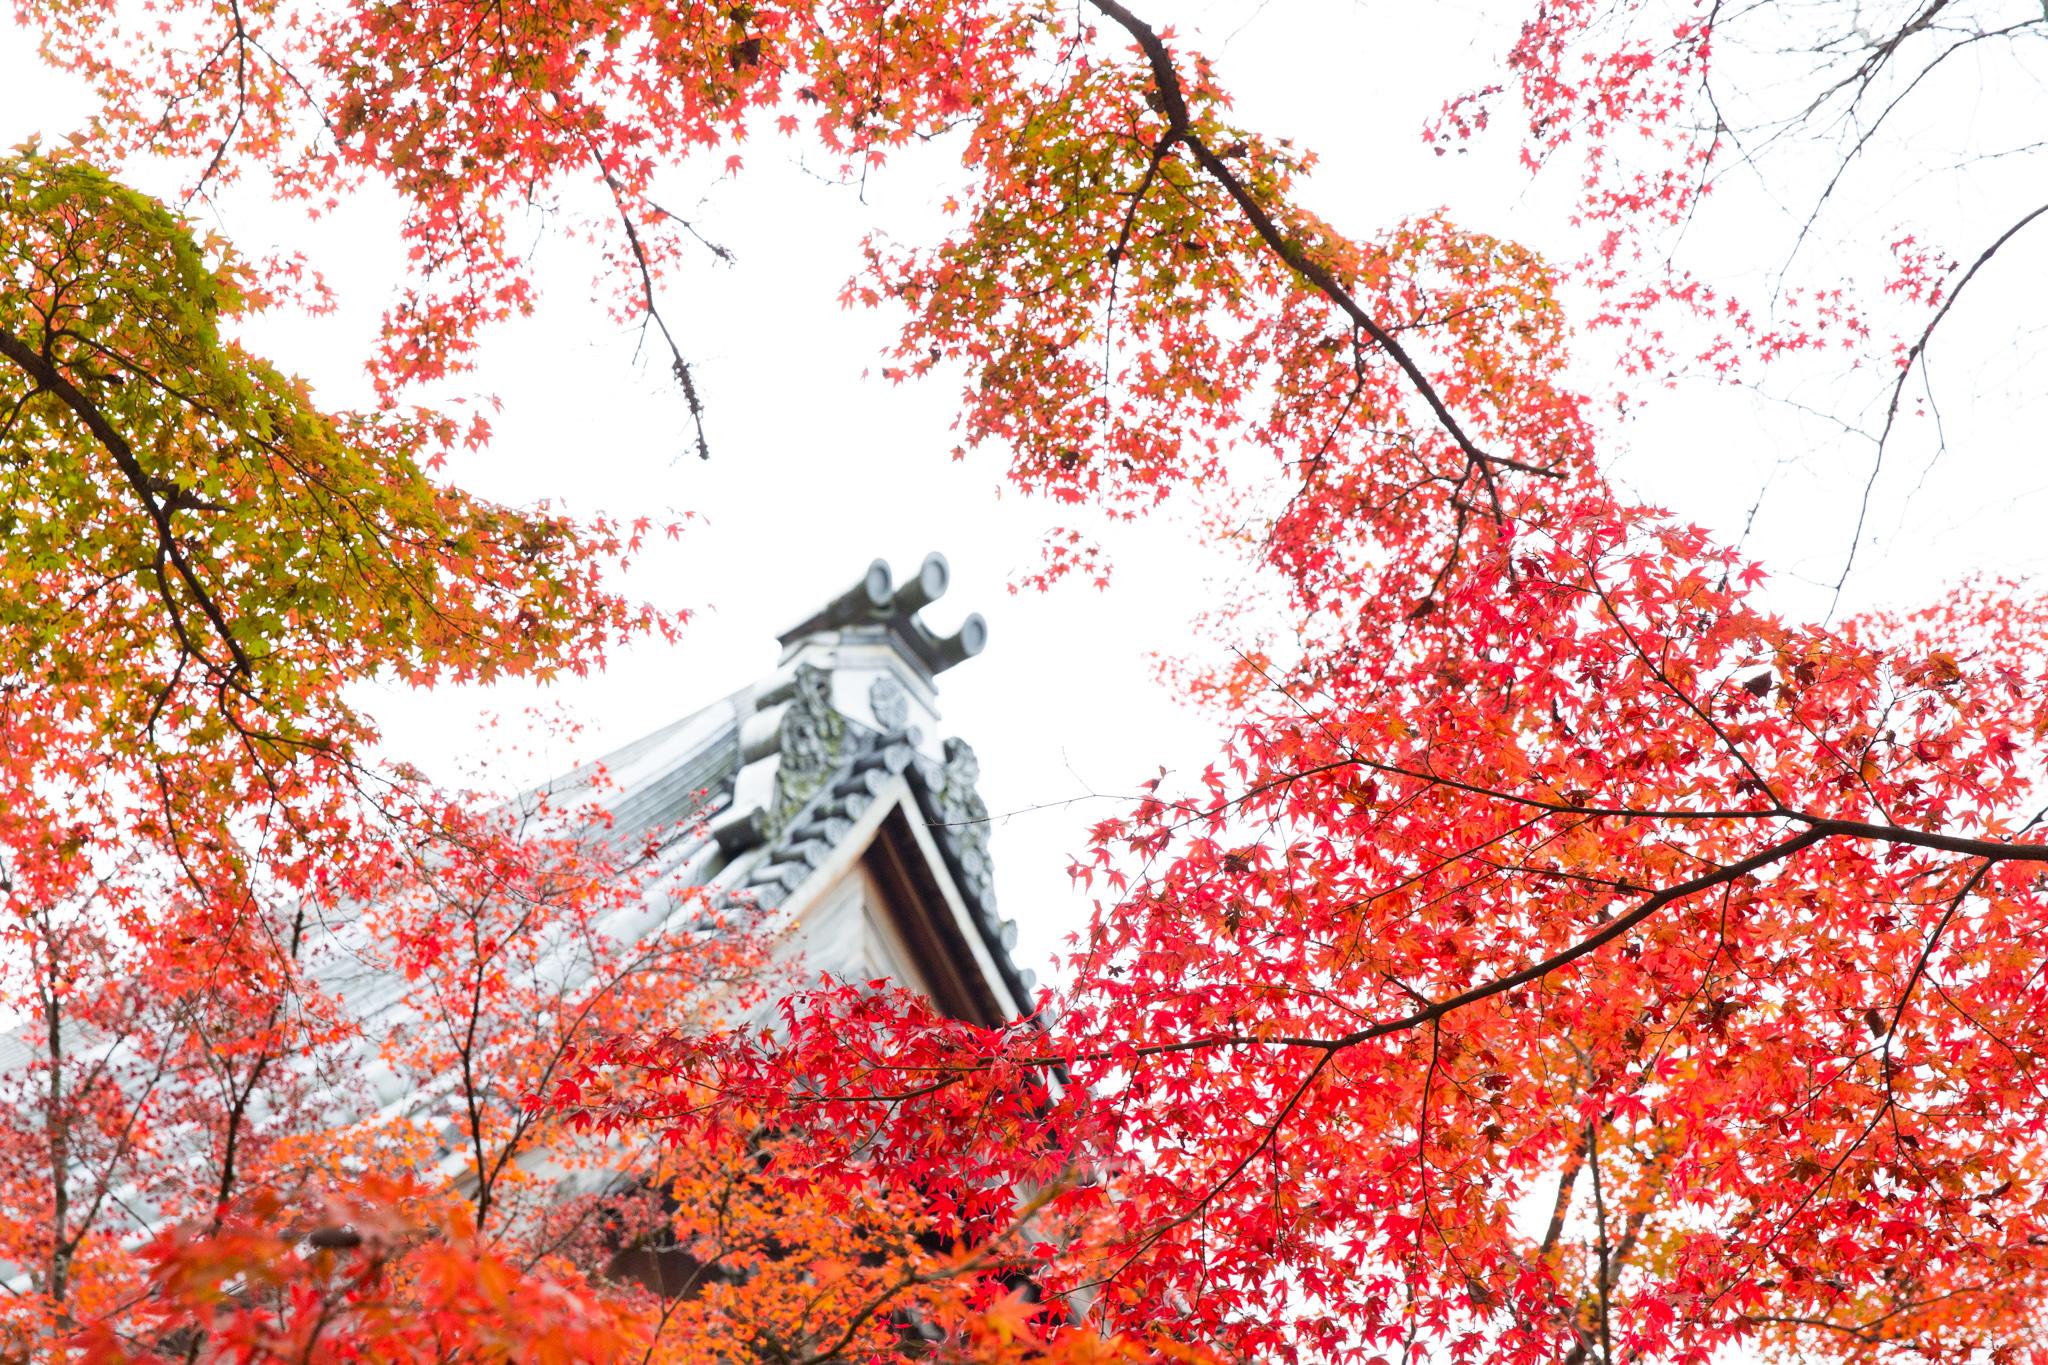 5260-japan-nature-cold-winter.jpg